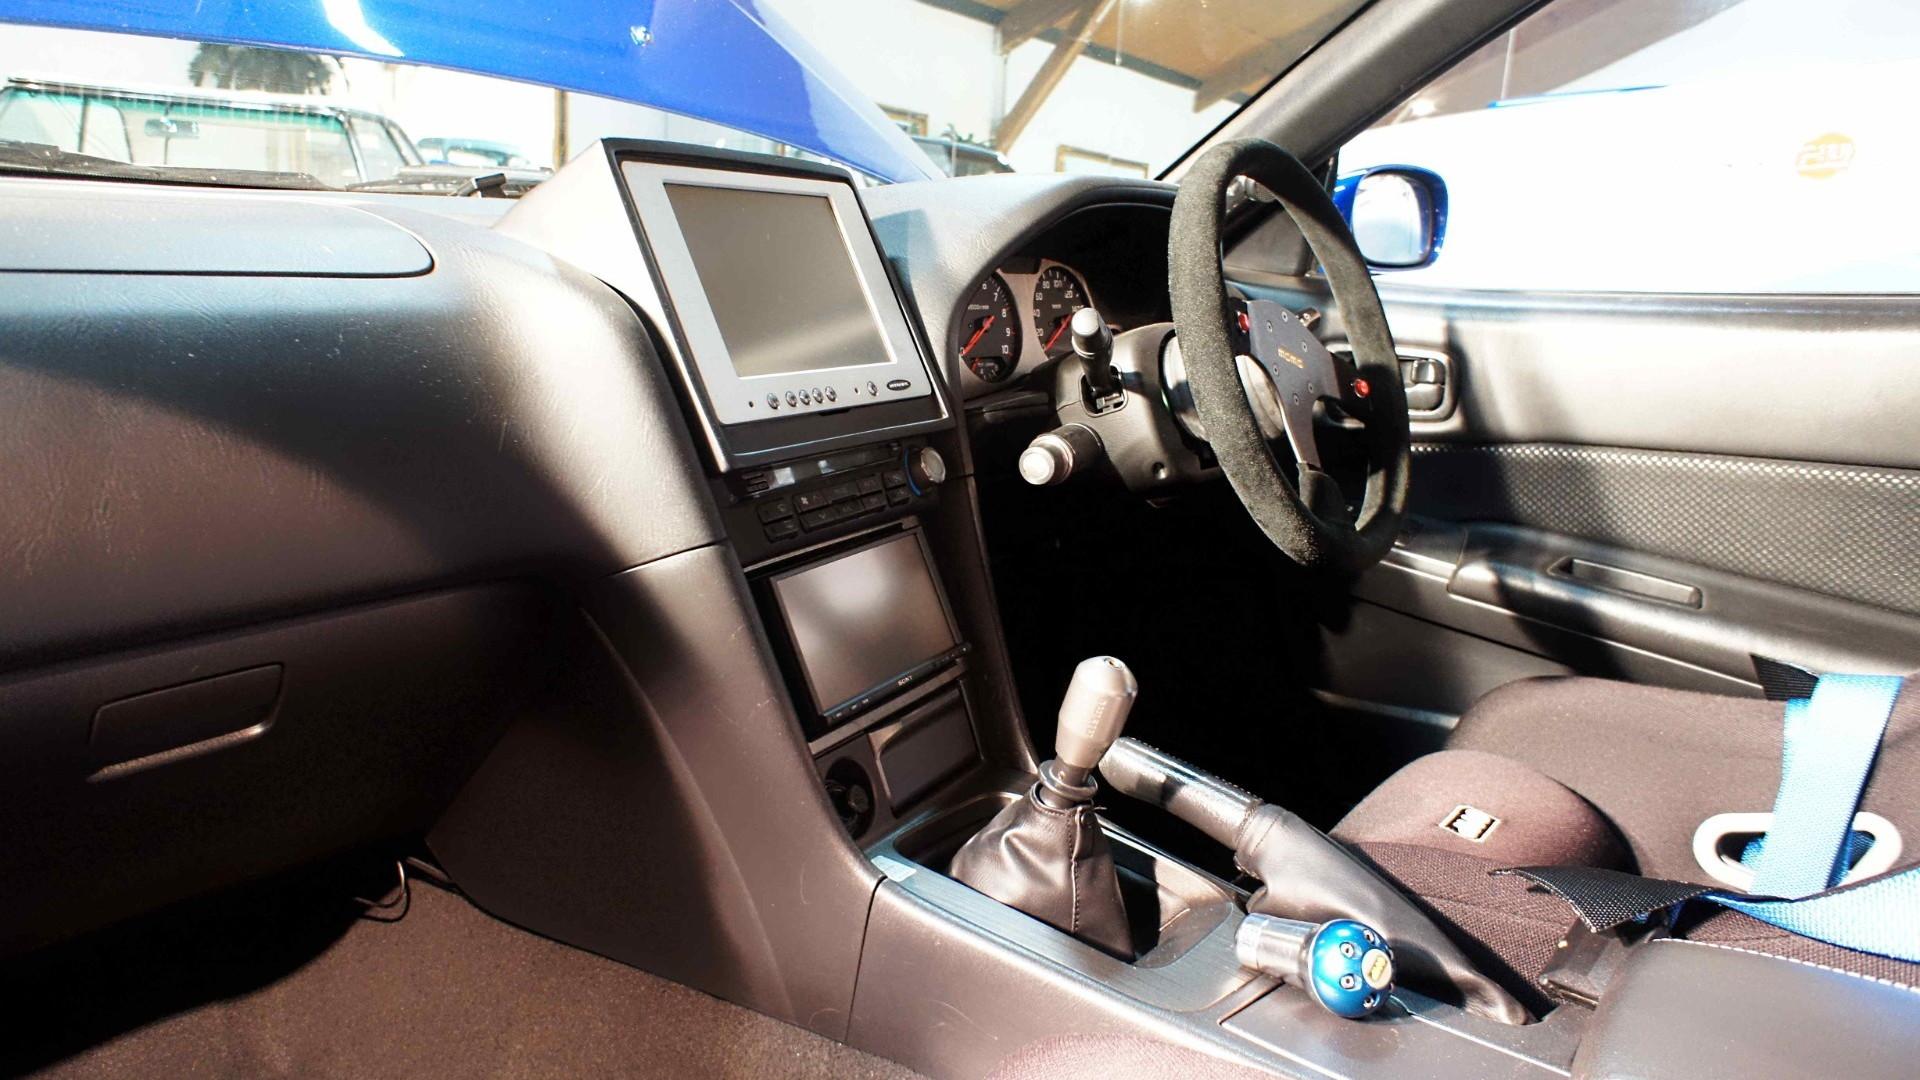 Paul Walker's Fast & Furious 4 R34 Nissan GT-R